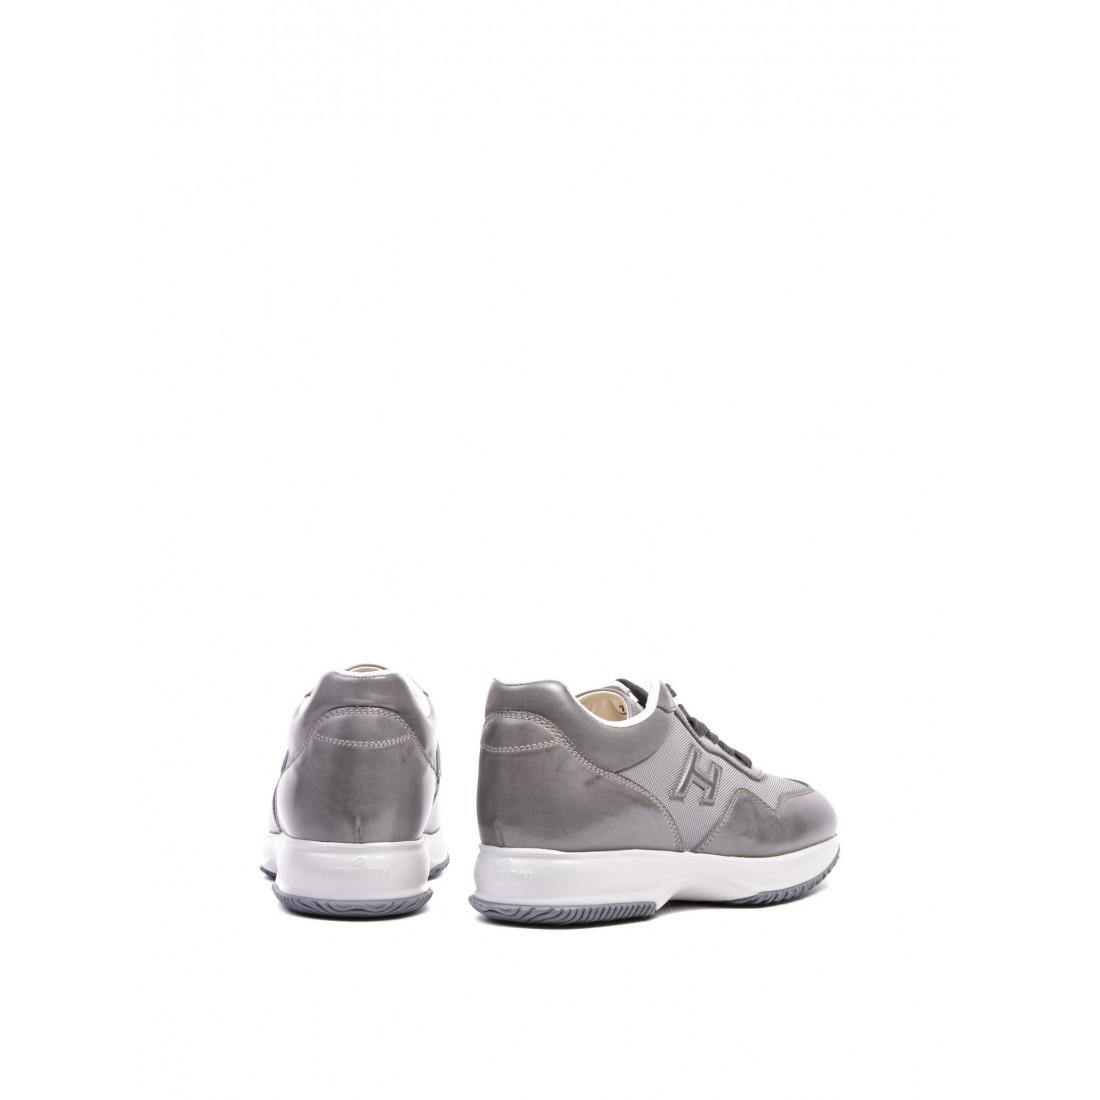 sneakers man hogan hxm00n0u0405zf4633 395